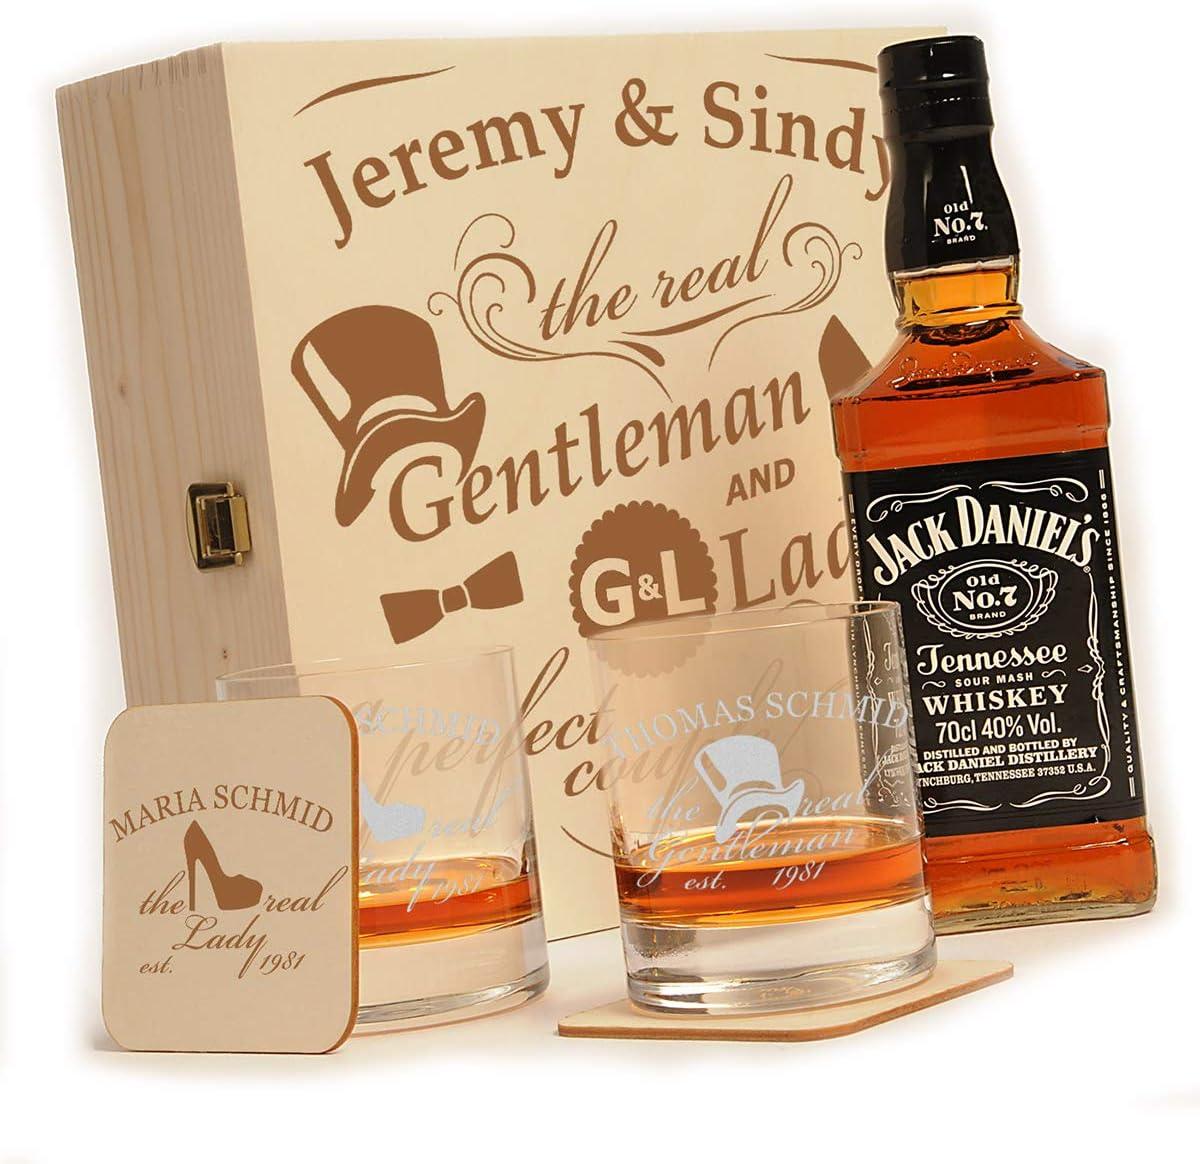 puede Whisky Botella Incluye grabado/ /Gentleman And Lady /Dise/ño/